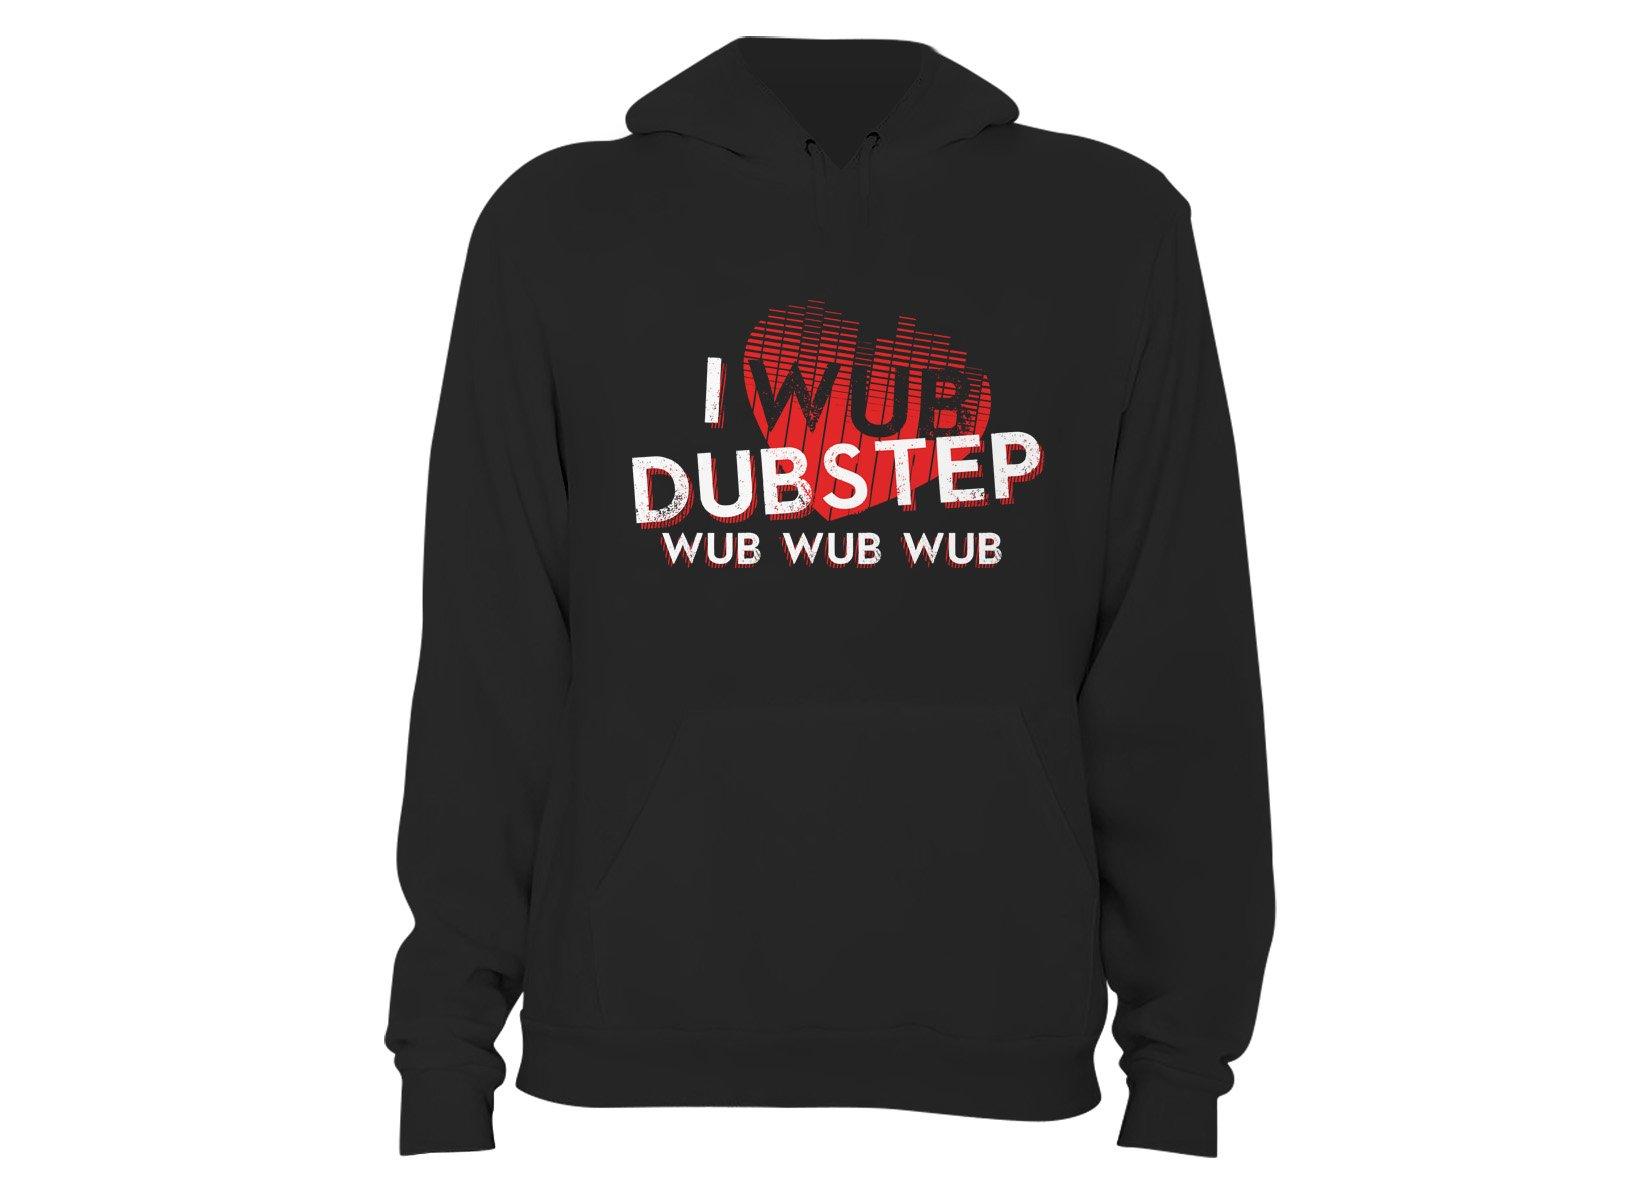 I Wub Dubstep on Hoodie